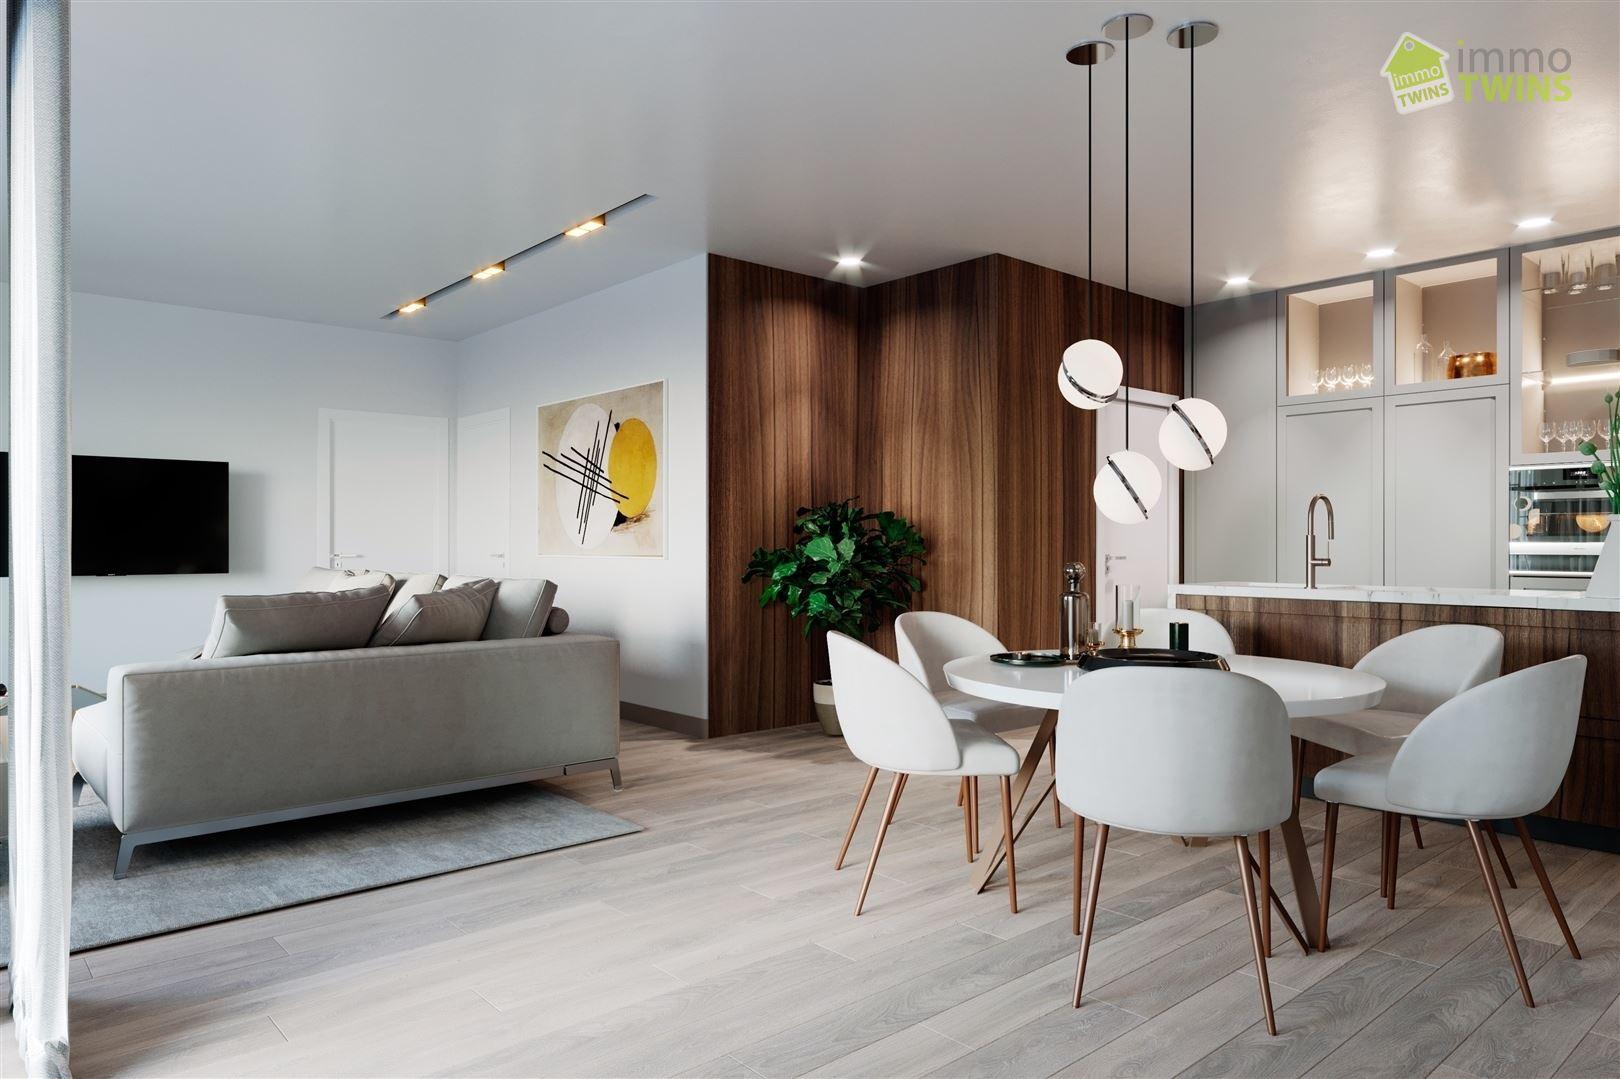 Foto 5 : Penthouse te 9220 MOERZEKE (België) - Prijs € 183.000